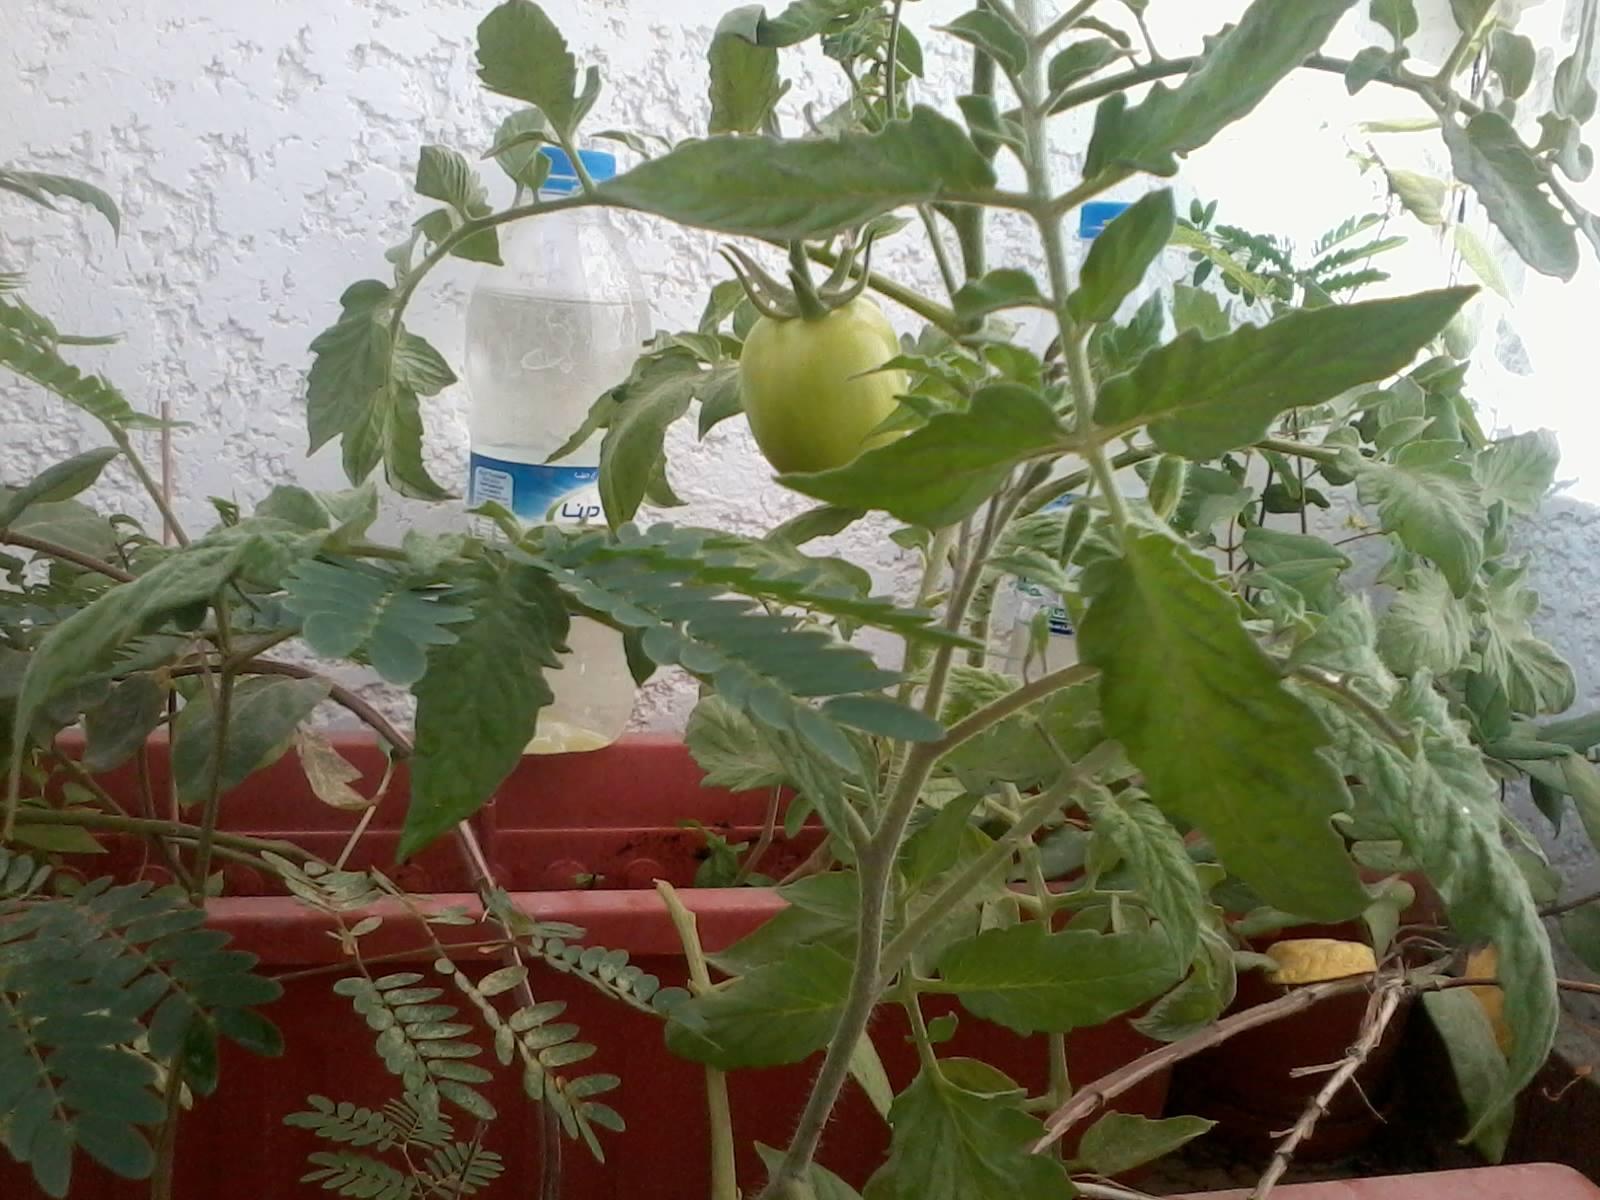 Tomato Gardening - Seeds To the Fruit